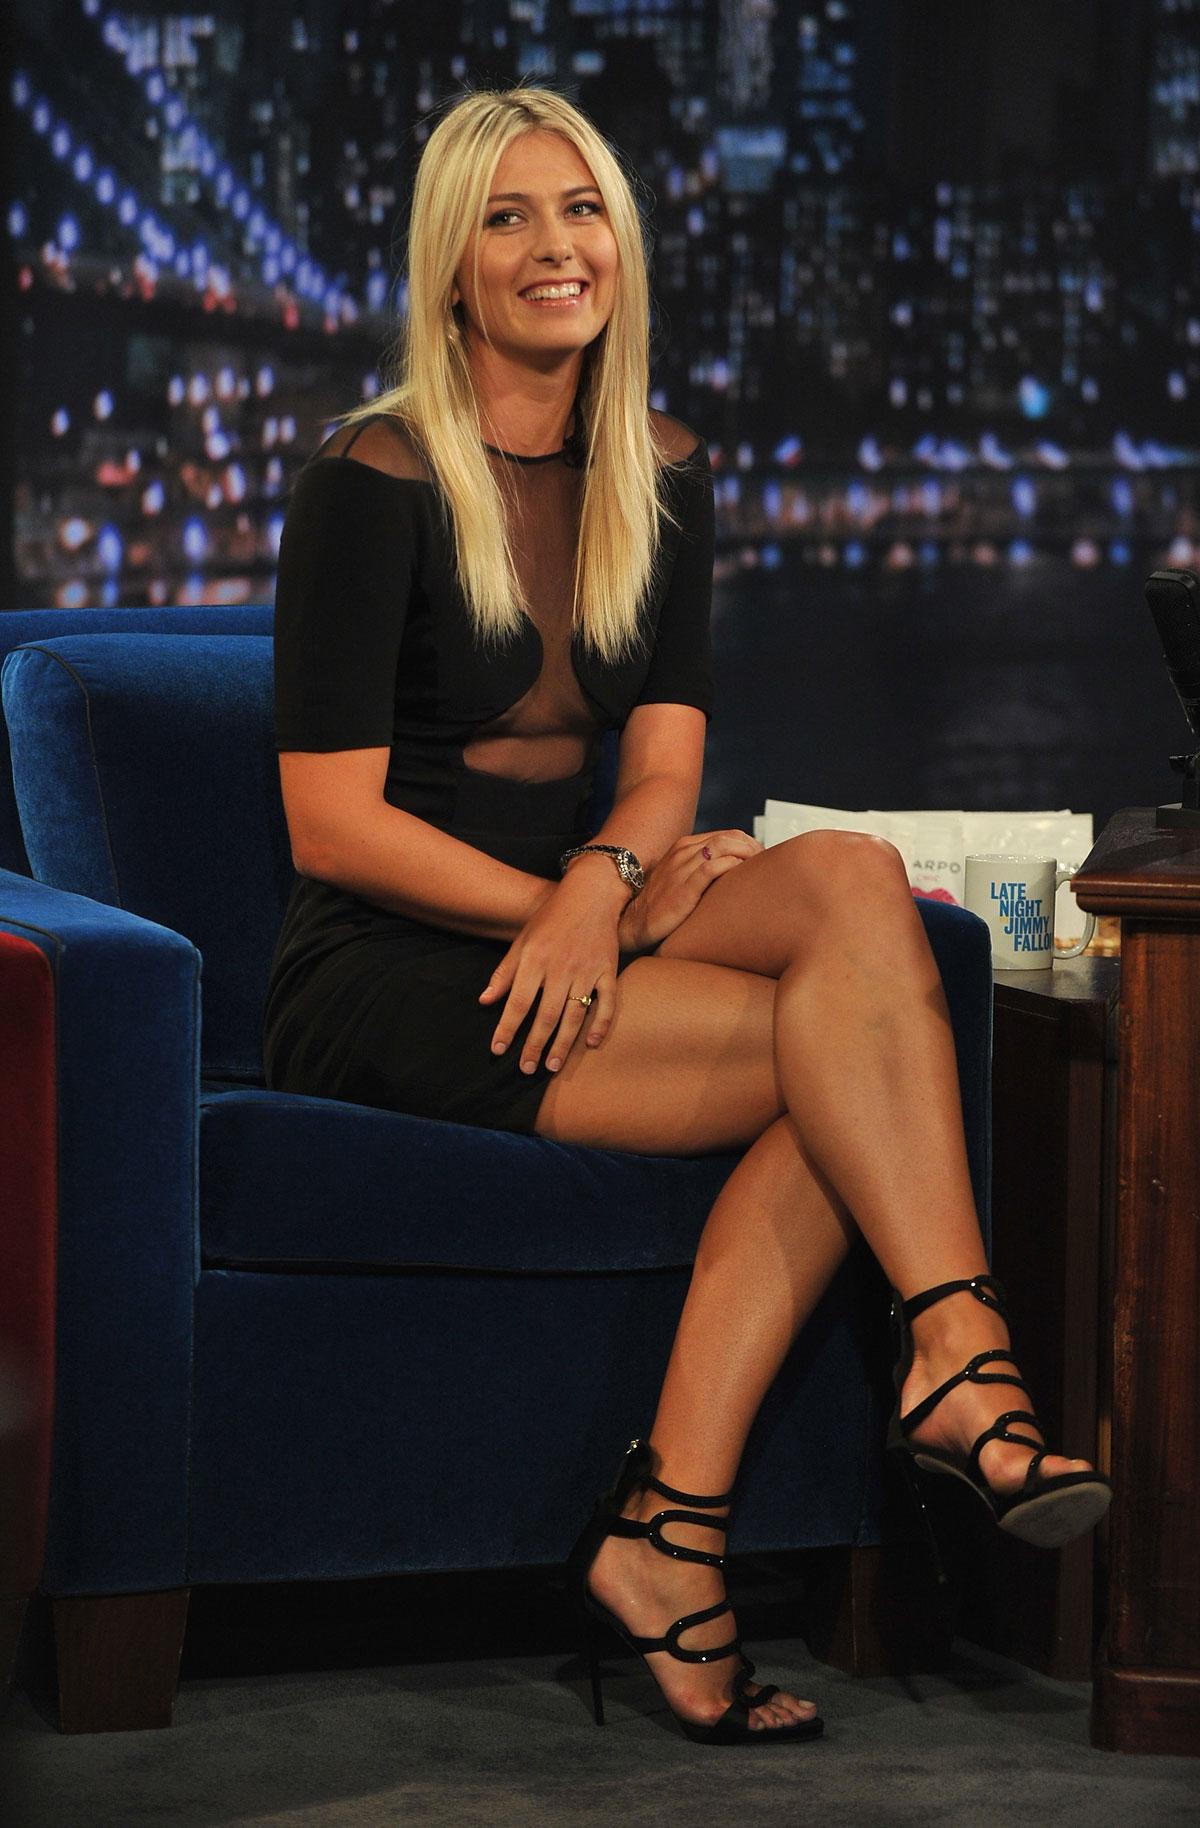 MARIA SHARAPOVA at Jimmy Kimmel Live! Show